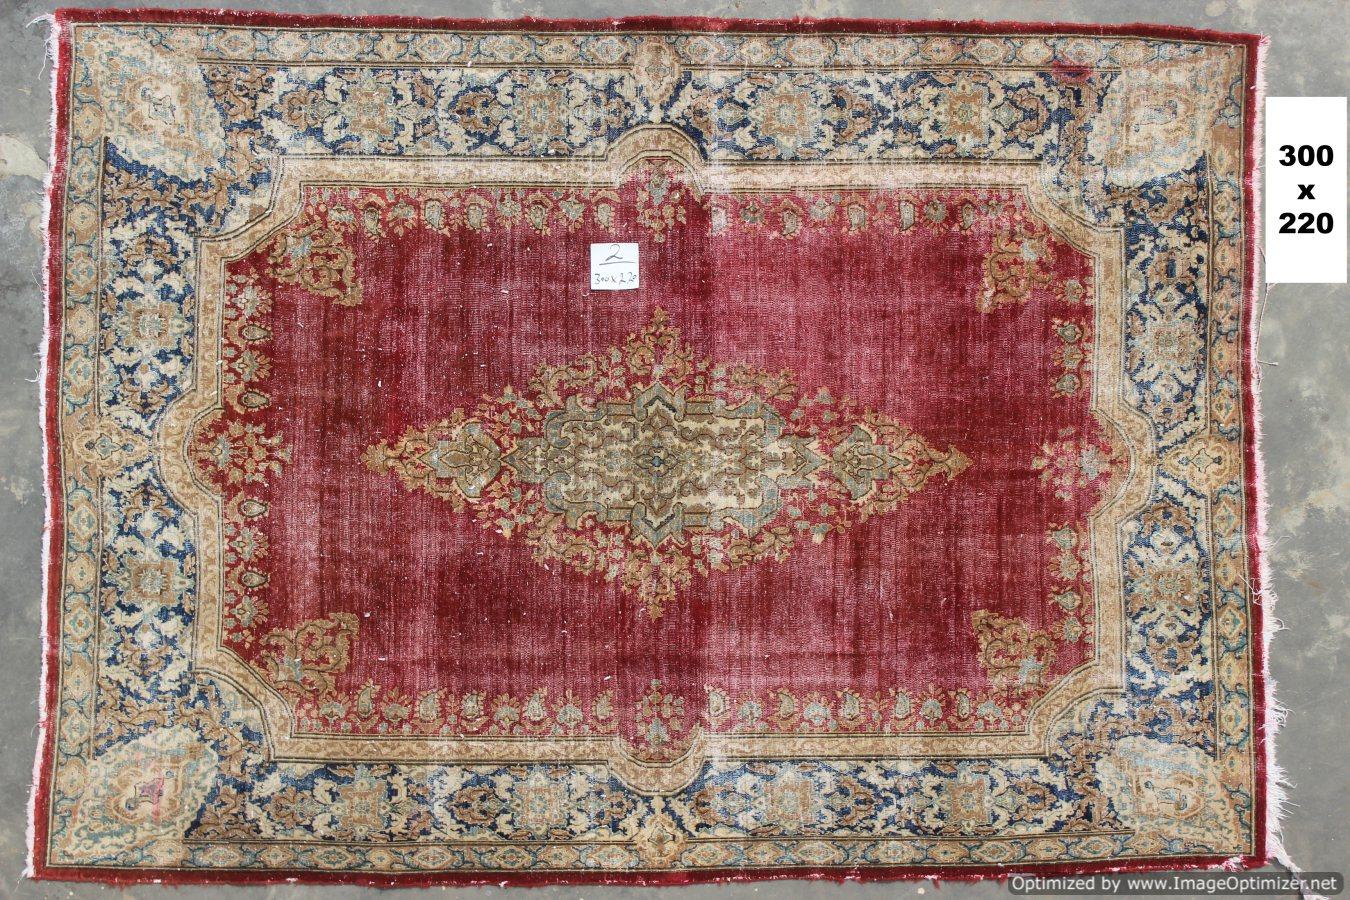 Vintage recoloured perzisch tapijt 02B (300cm x 220cm)